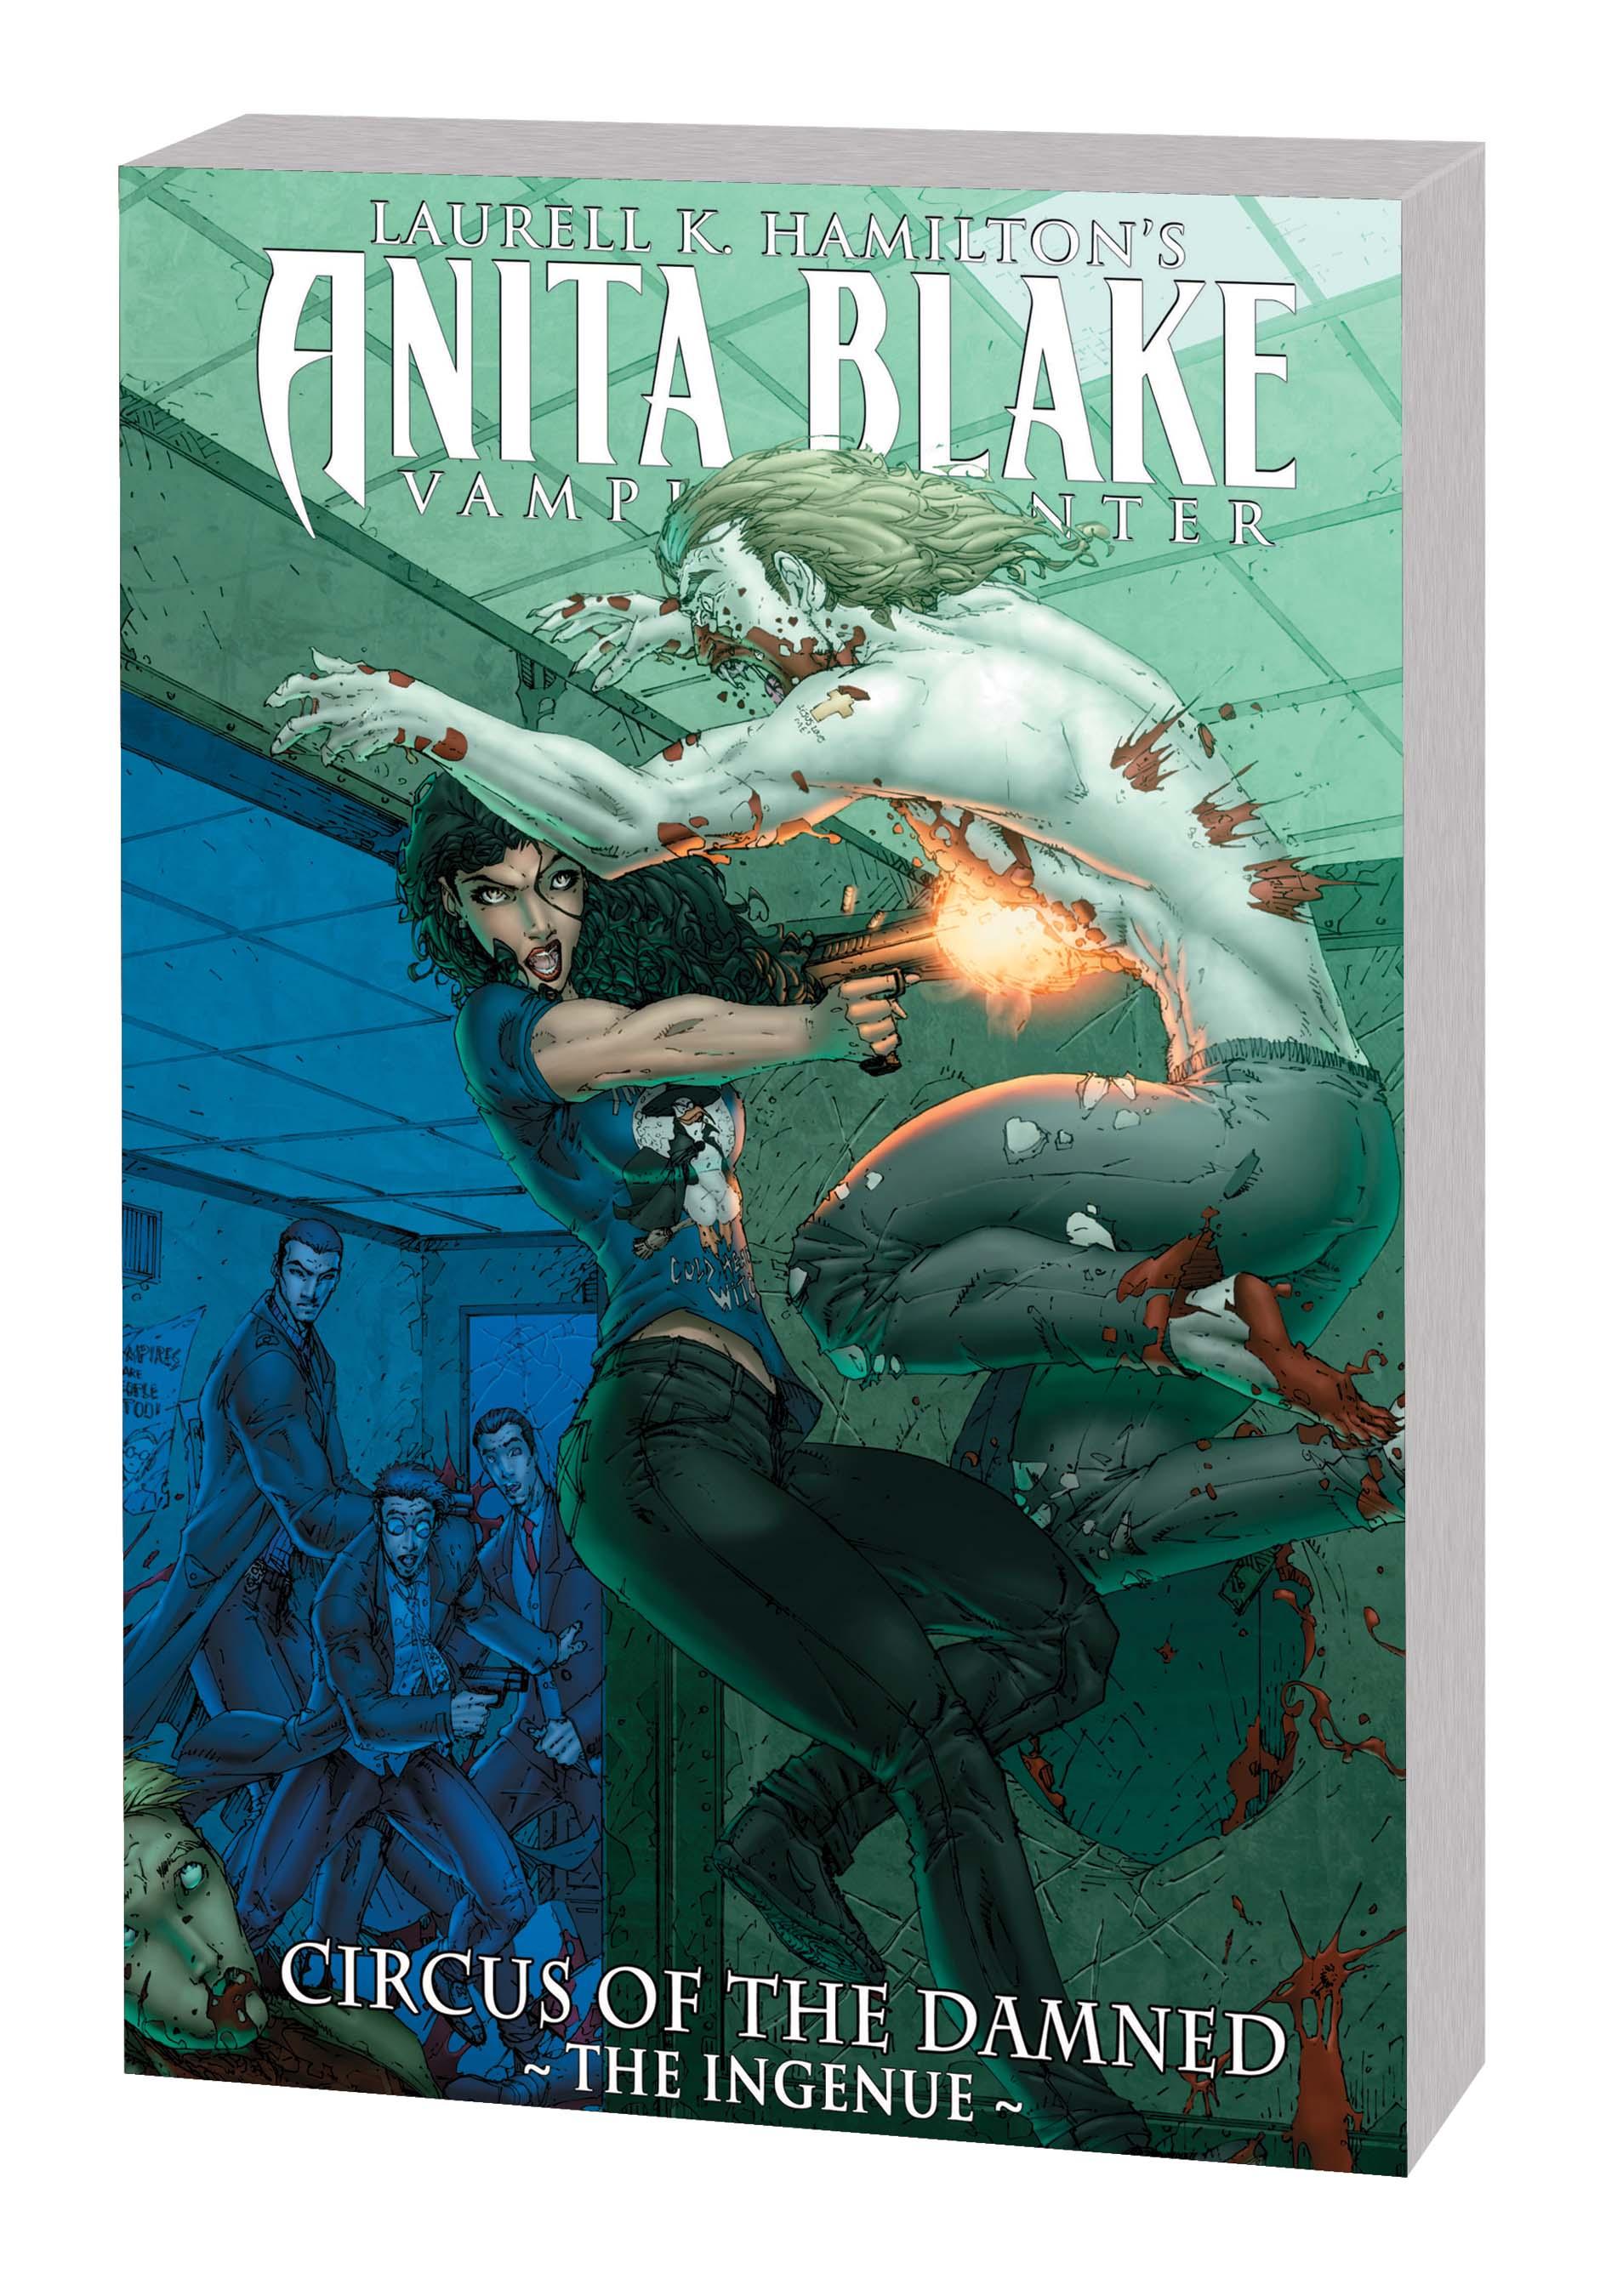 Anita Blake, Vampire Hunter: Circus of the Damned Book 2 - The Ingenue TPB (Trade Paperback)